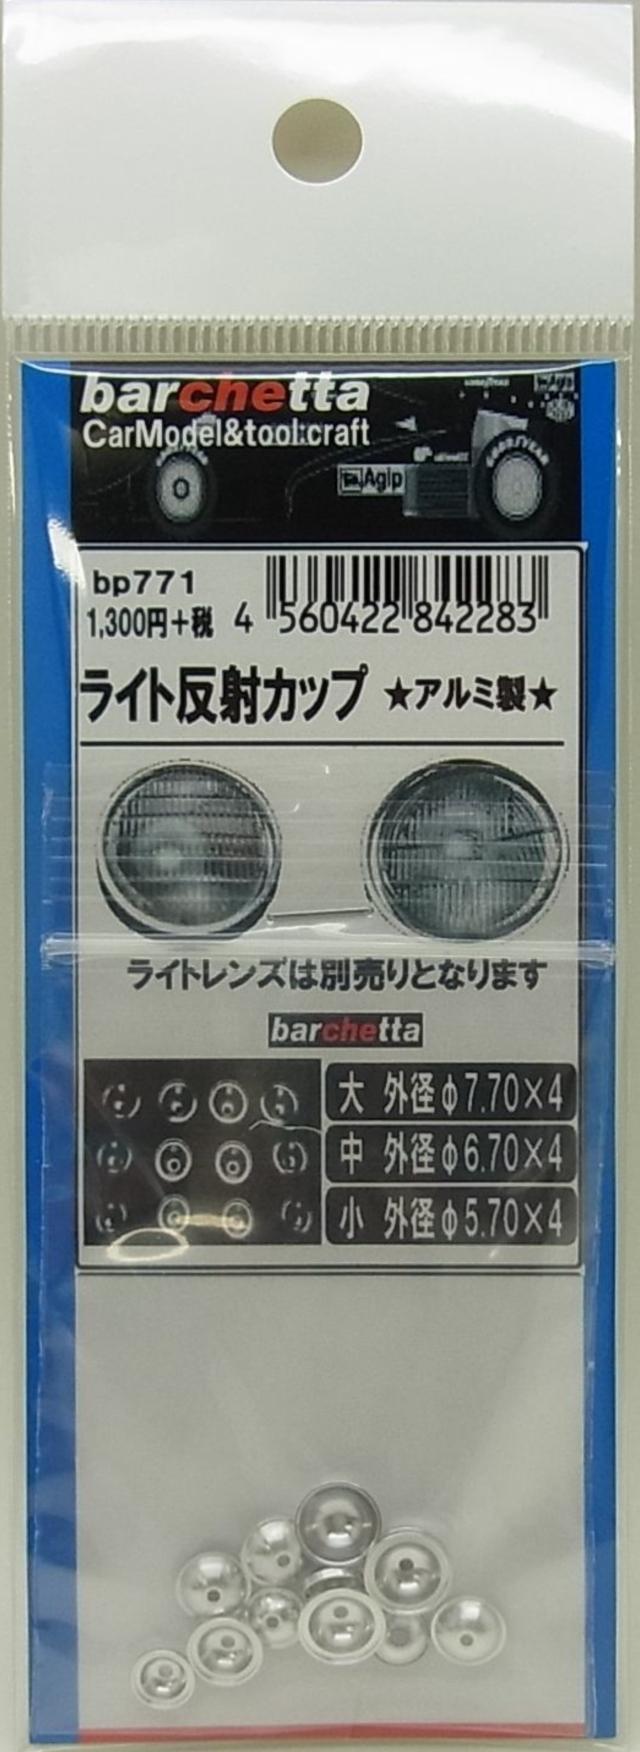 bp771   ライトリム 反射カップ  金属なので光りの反射がリアルです。アルミ製